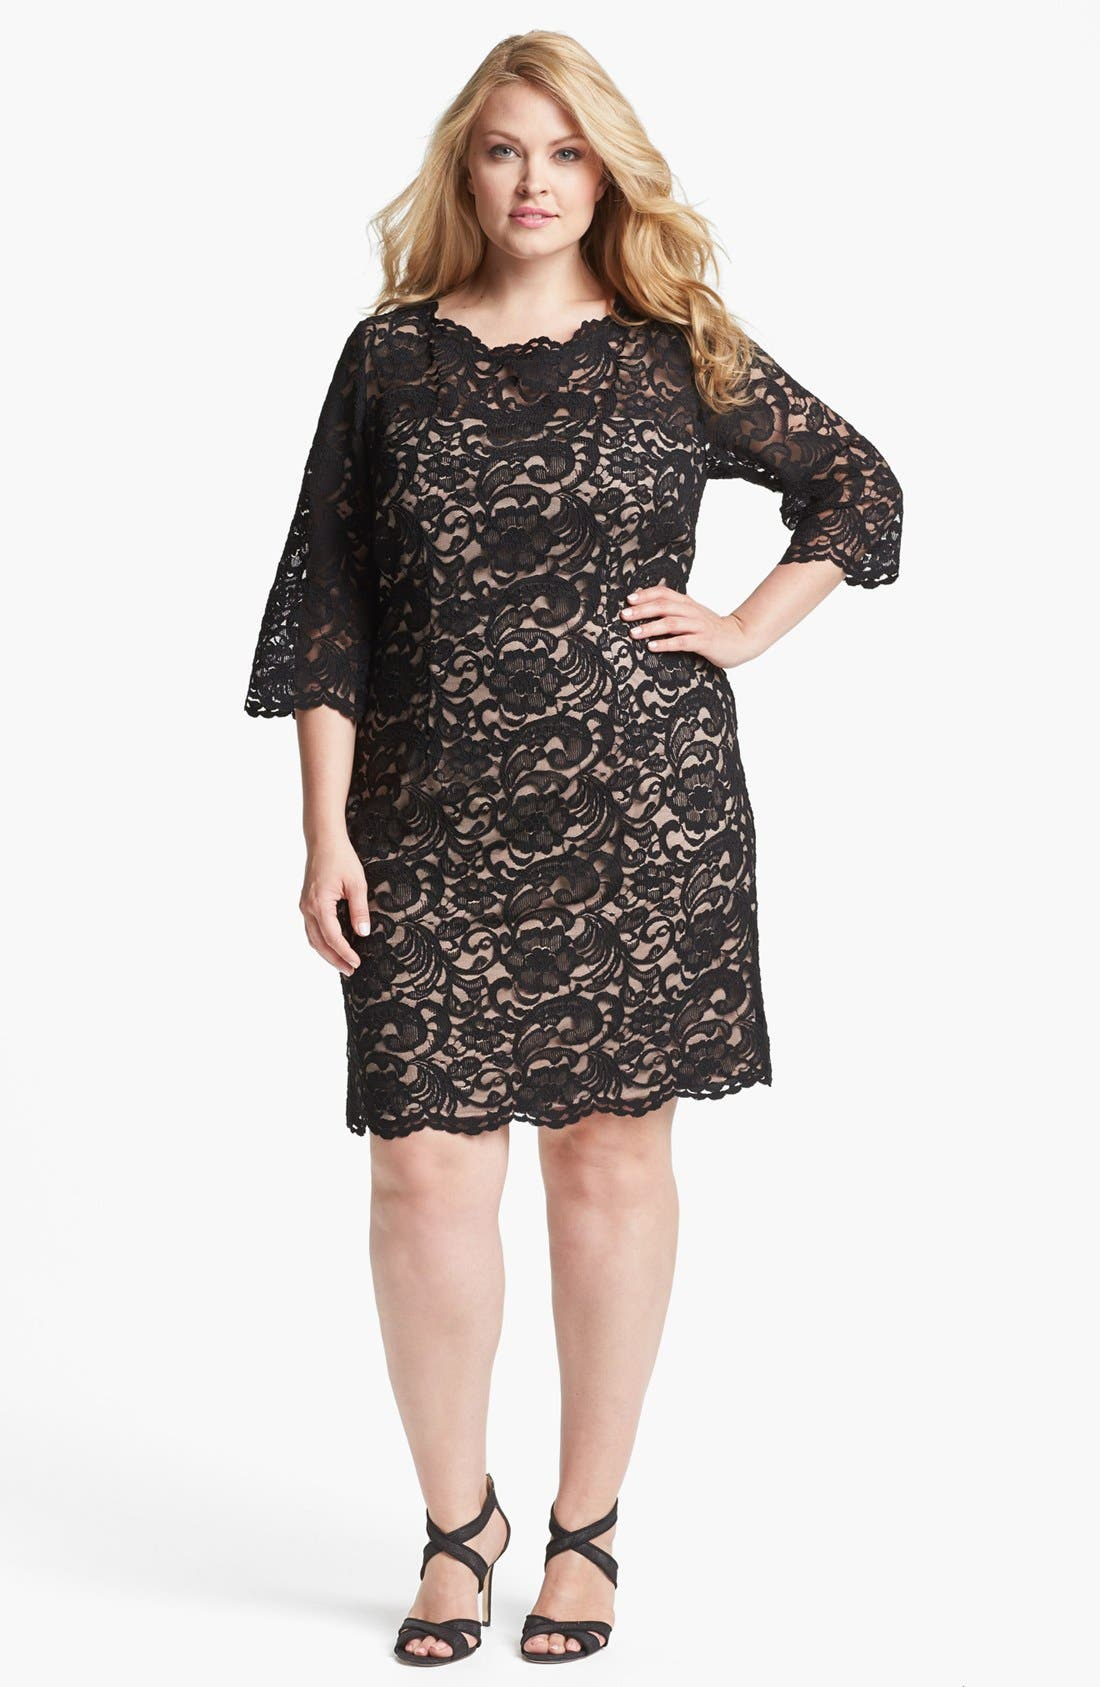 Alternate Image 1 Selected - Xscape Lace Shift Dress (Plus Size)